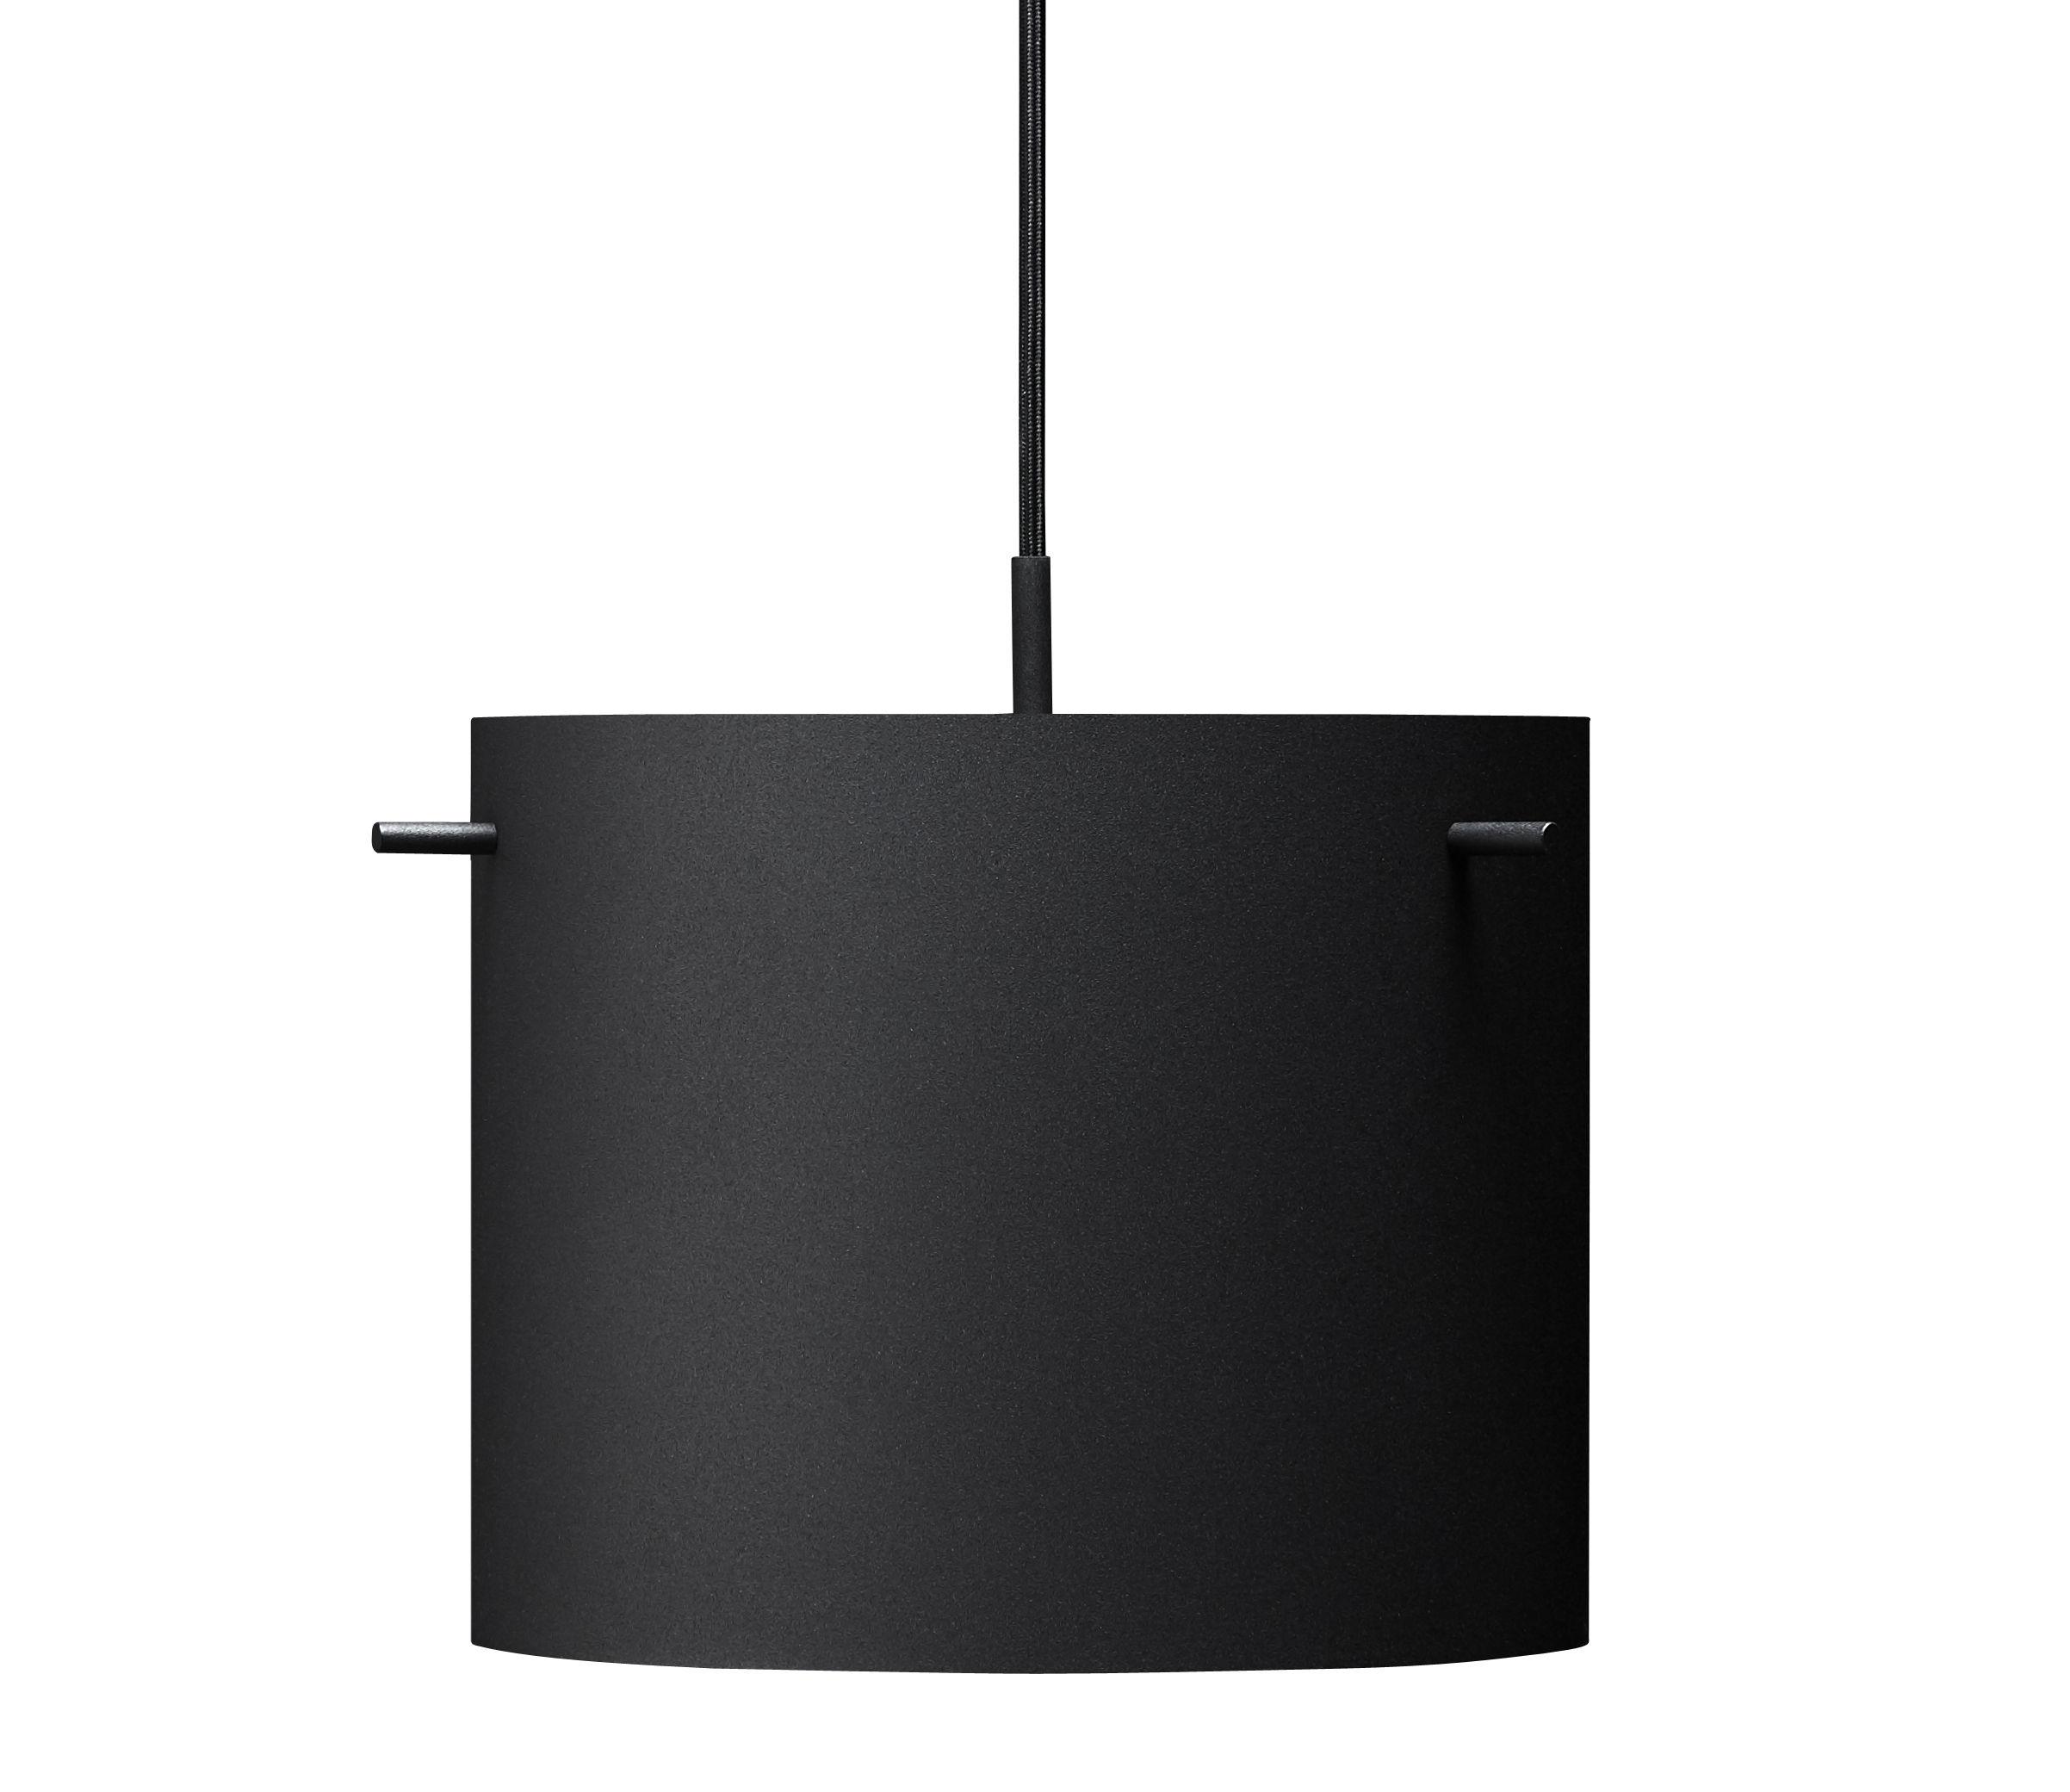 Luminaire - Suspensions - Suspension FM 1954 / Medium - Ø 28 x H 23 cm - Rewired - Noir - Acier laqué époxy